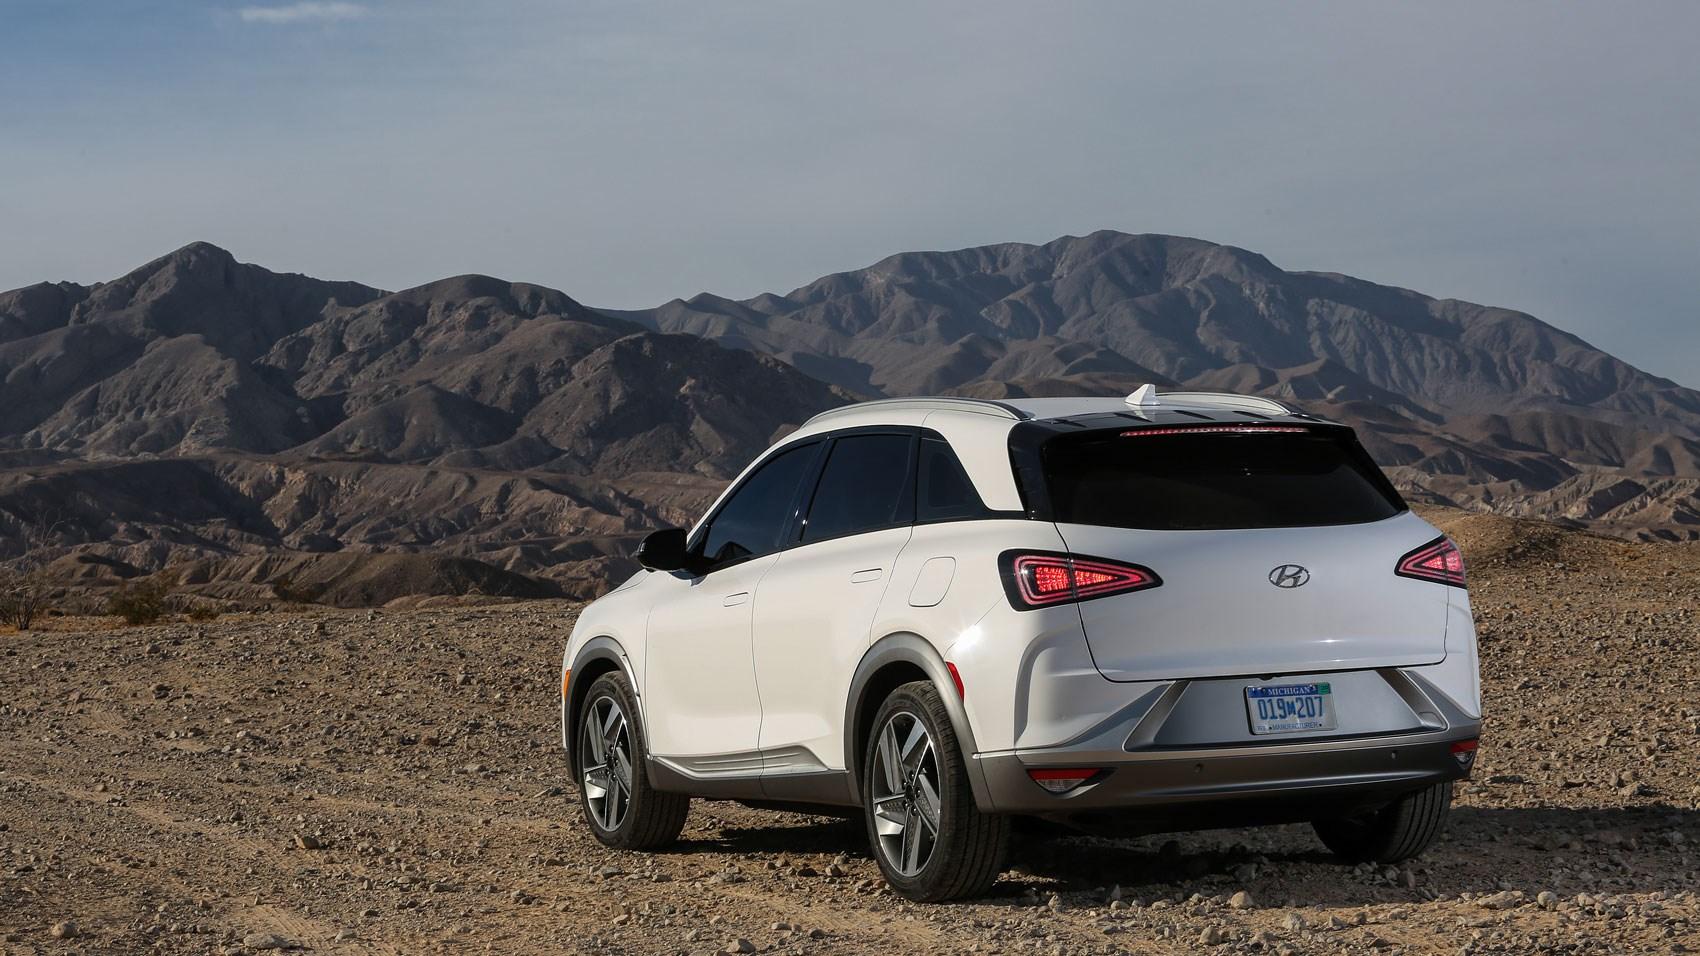 Hyundai Nexo Fcev 2018 Early Drive Review Hydrogen V2 0 Car